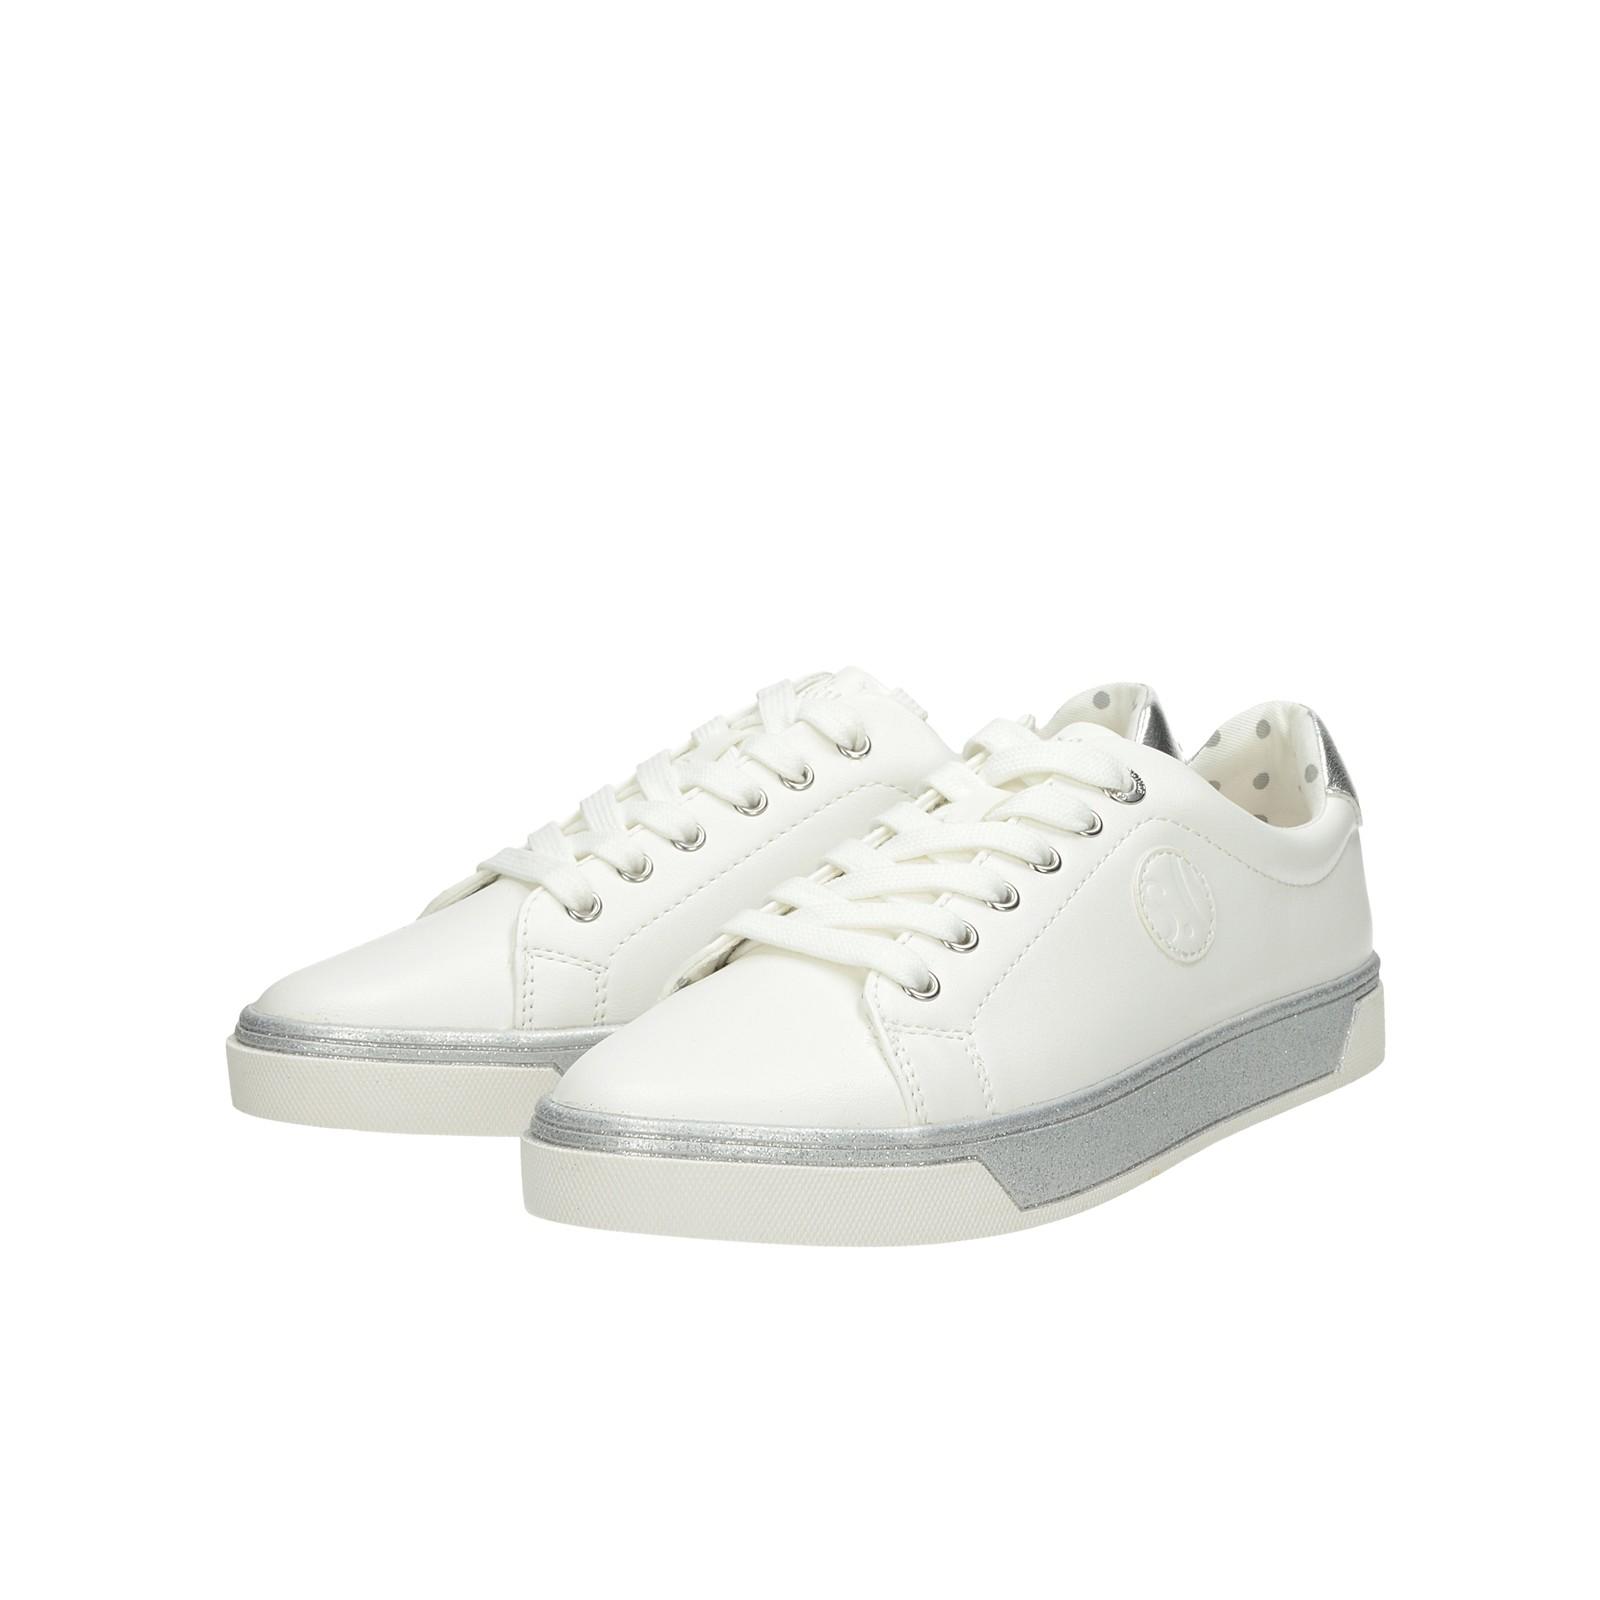 7dff83376f6f7 s.Oliver dámske štýlové tenisky - biele | 2363722-WHT www.robel.sk